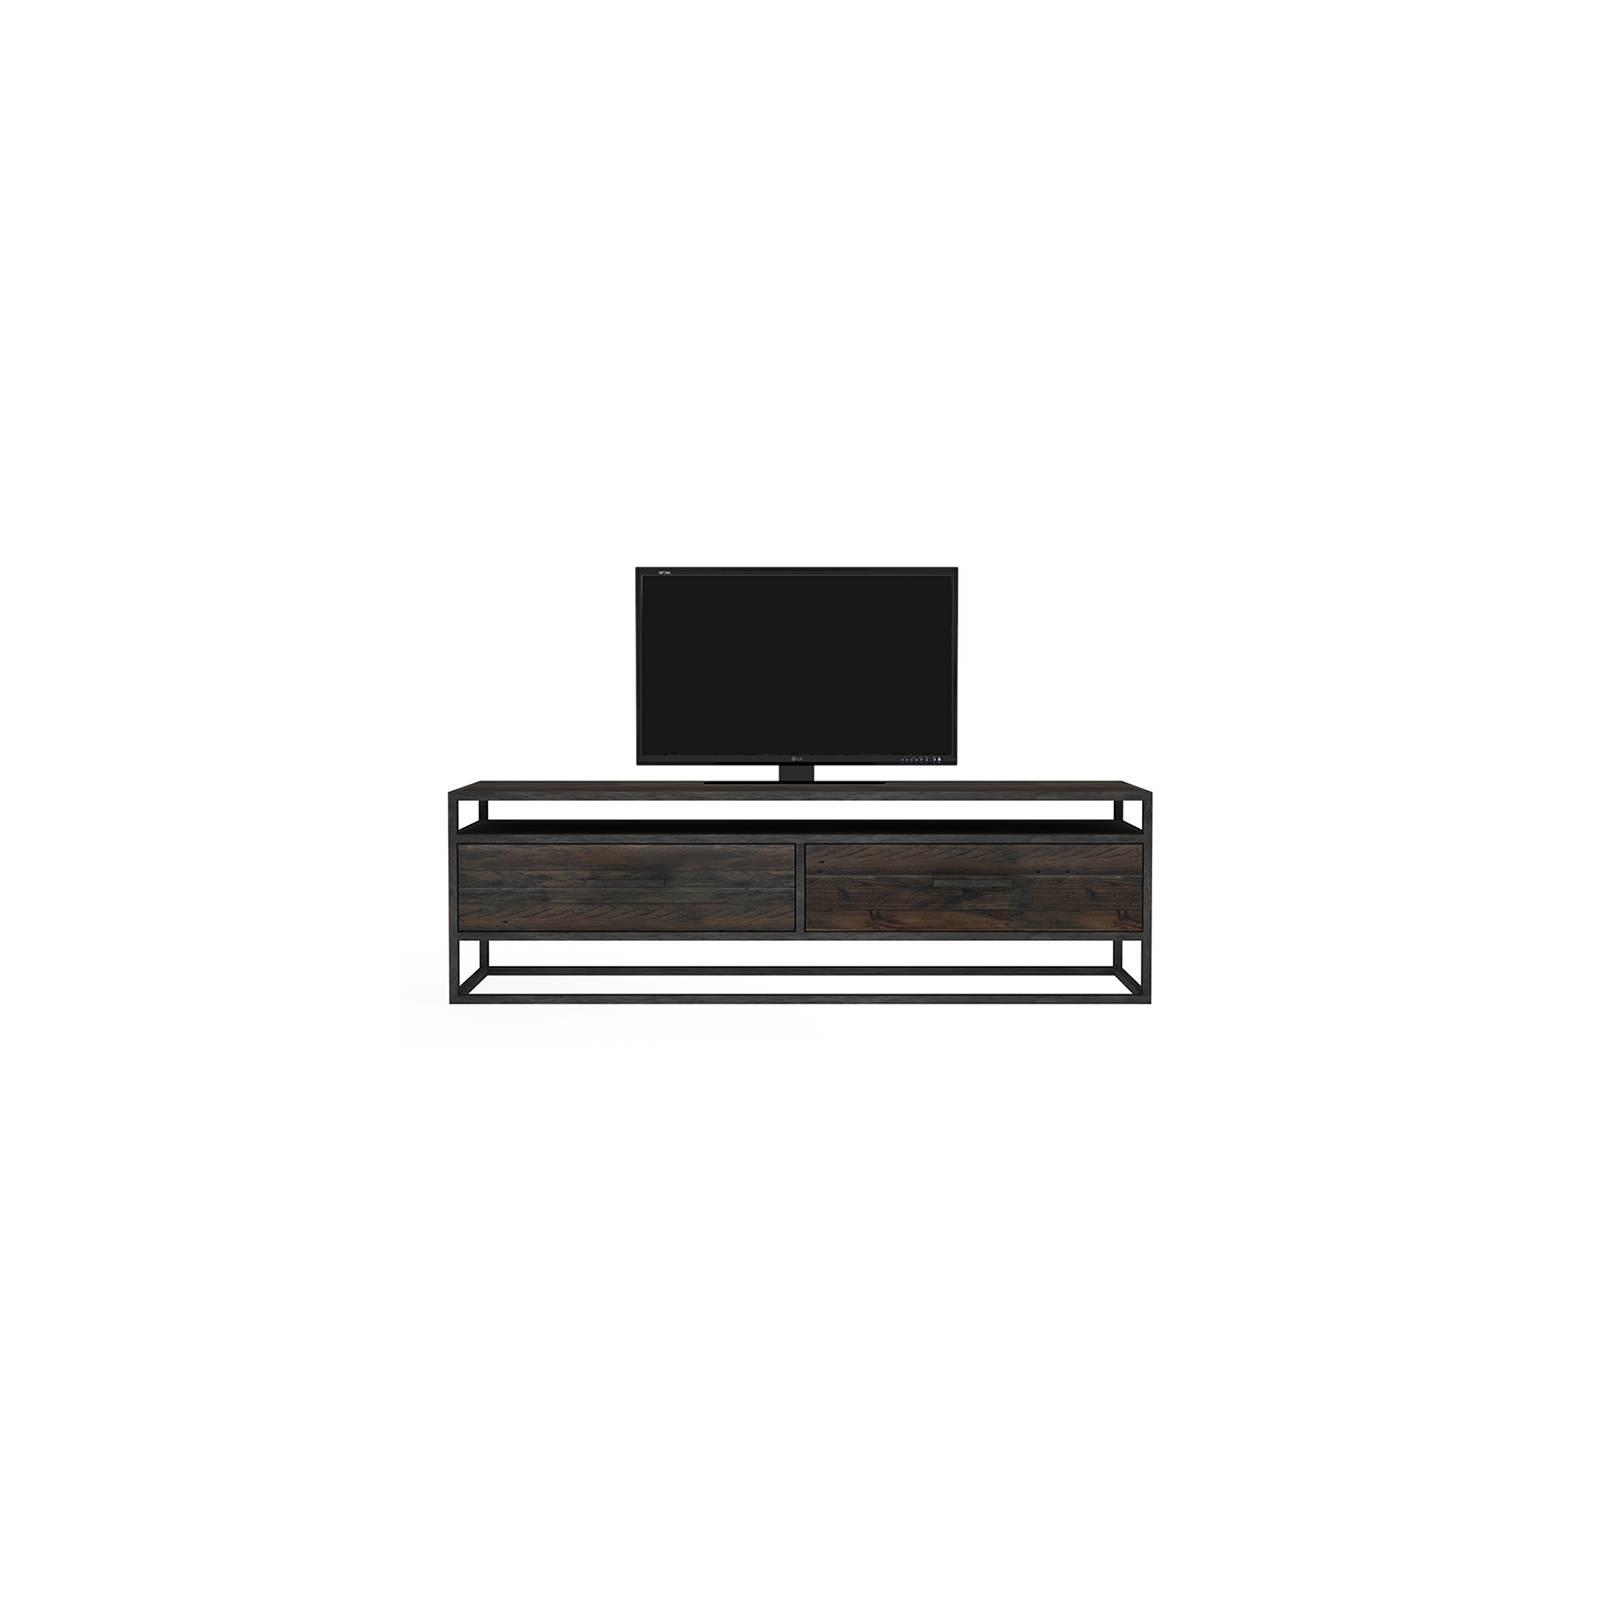 Meuble Tv 2 tiroirs Chicago Bois Recyclé